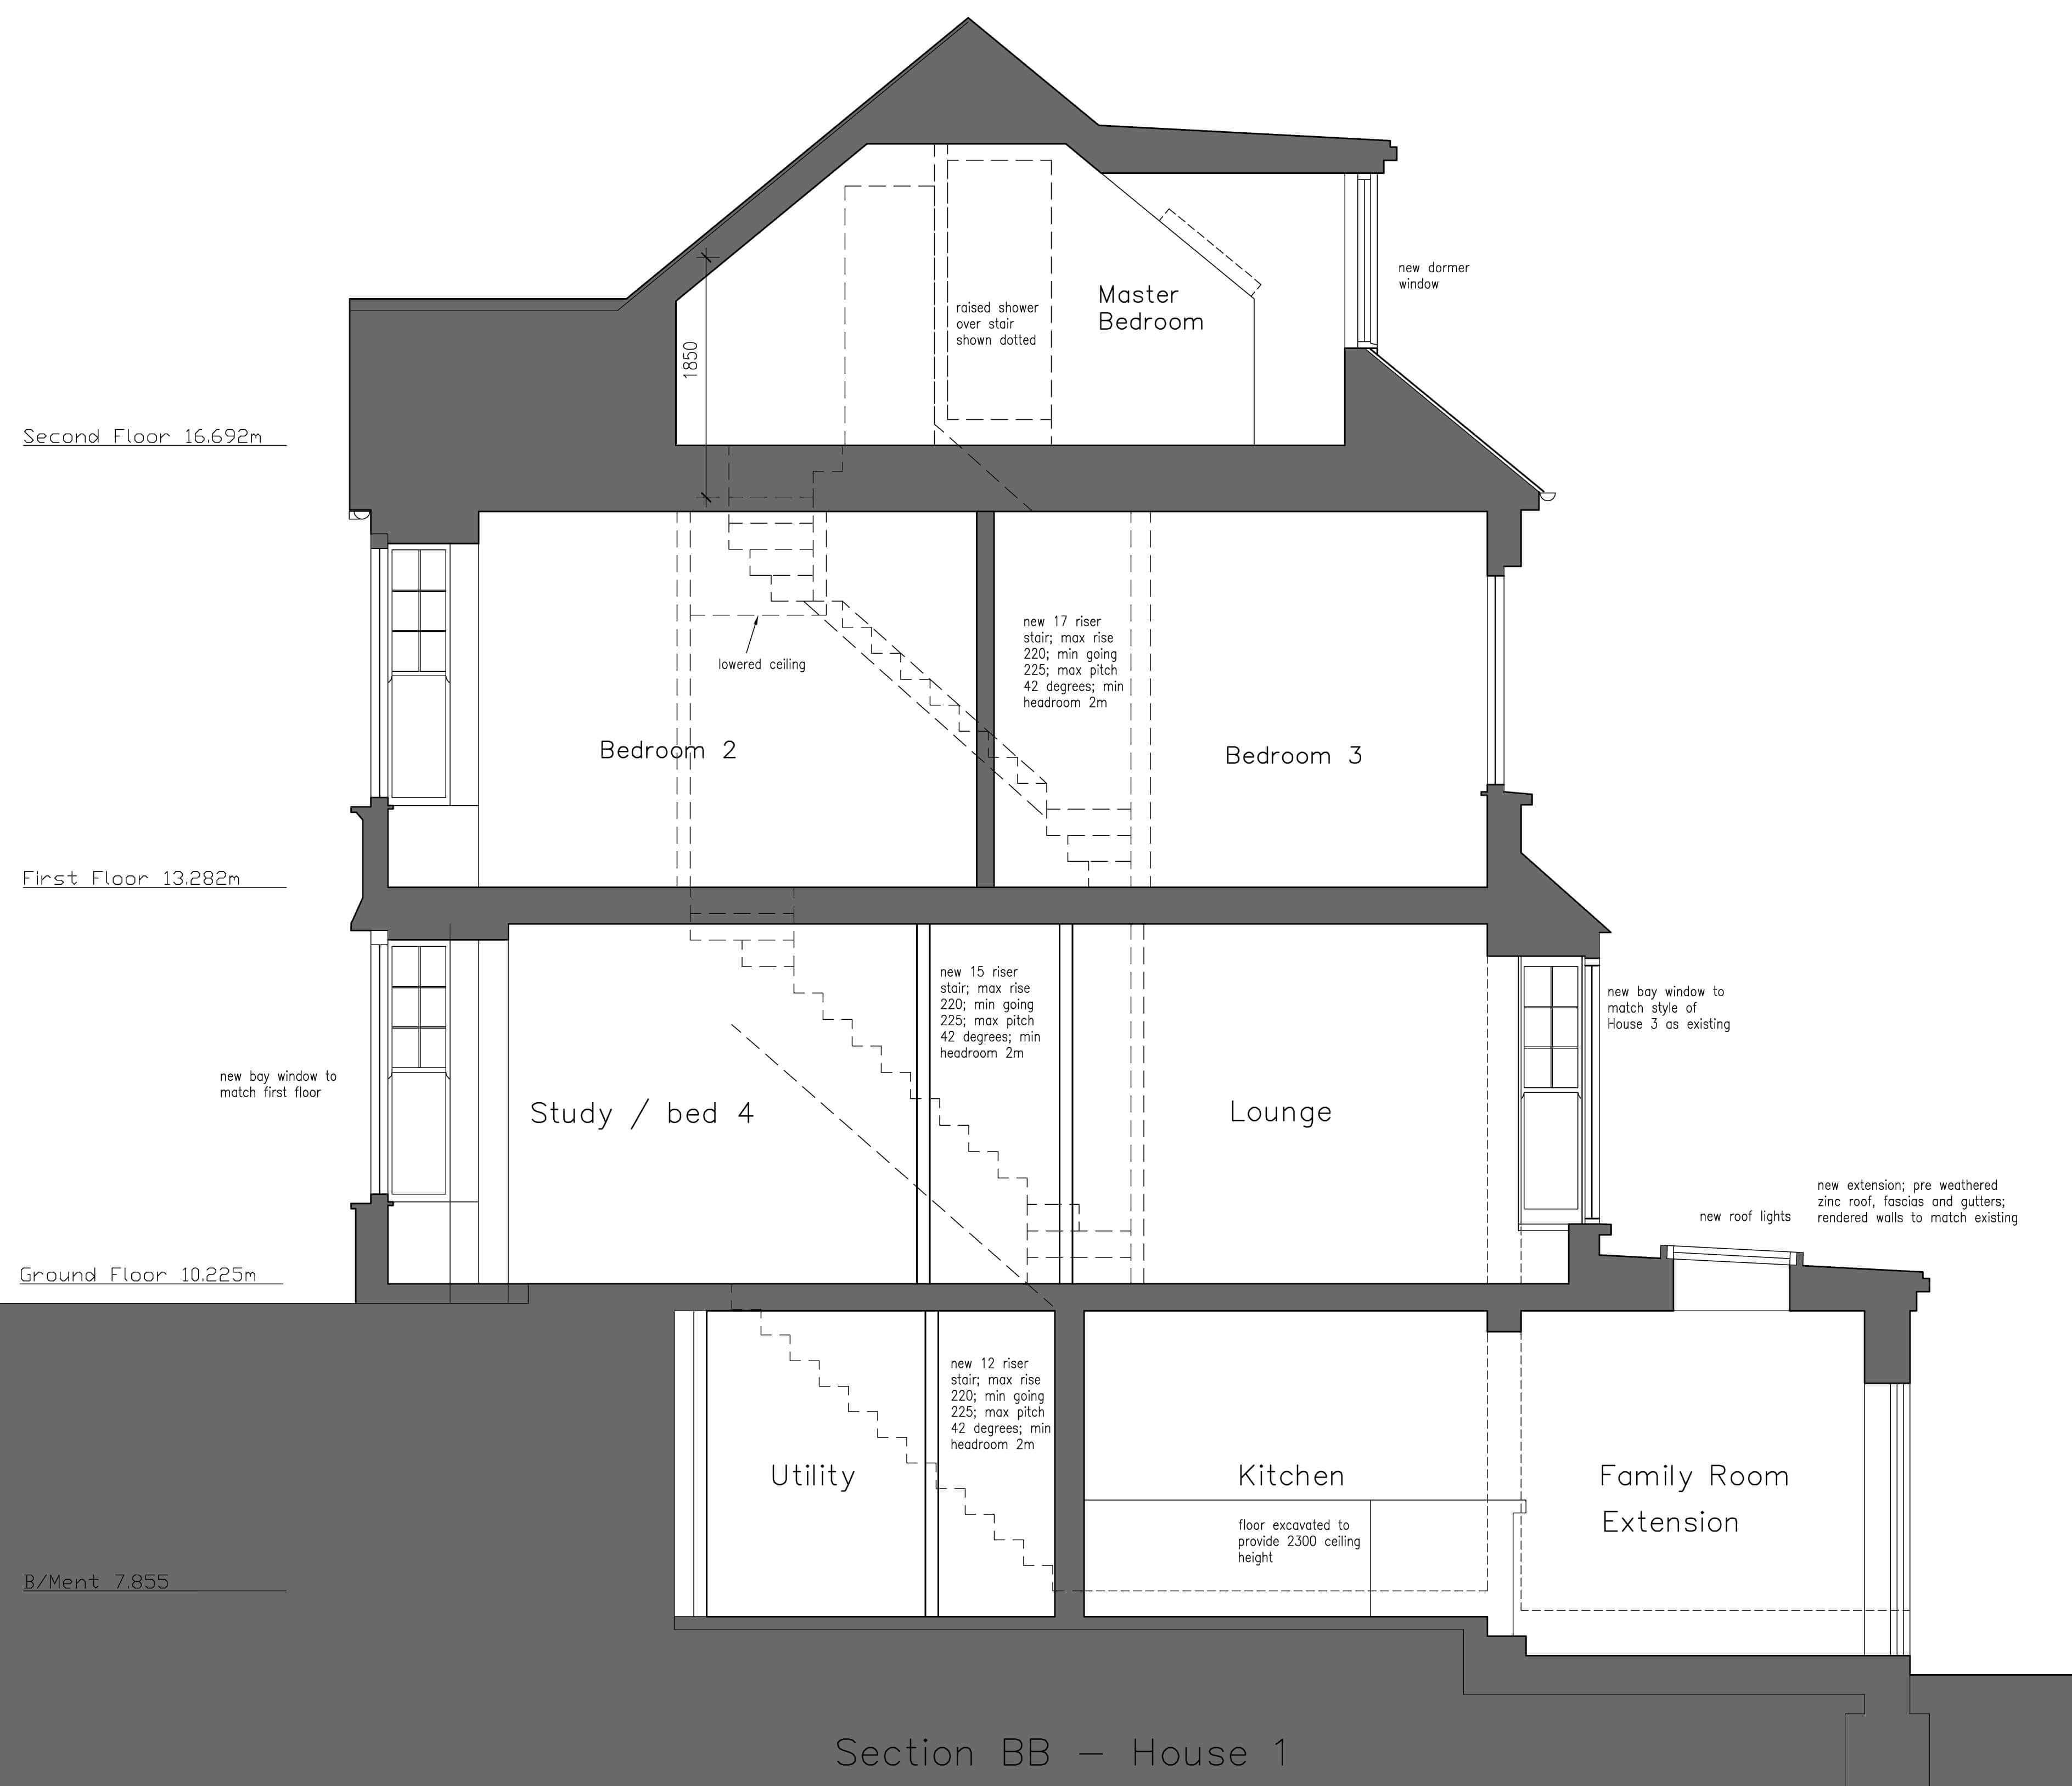 D:DocsJW Projects1514 36 Robertson Road5.1 drawings1514Plan